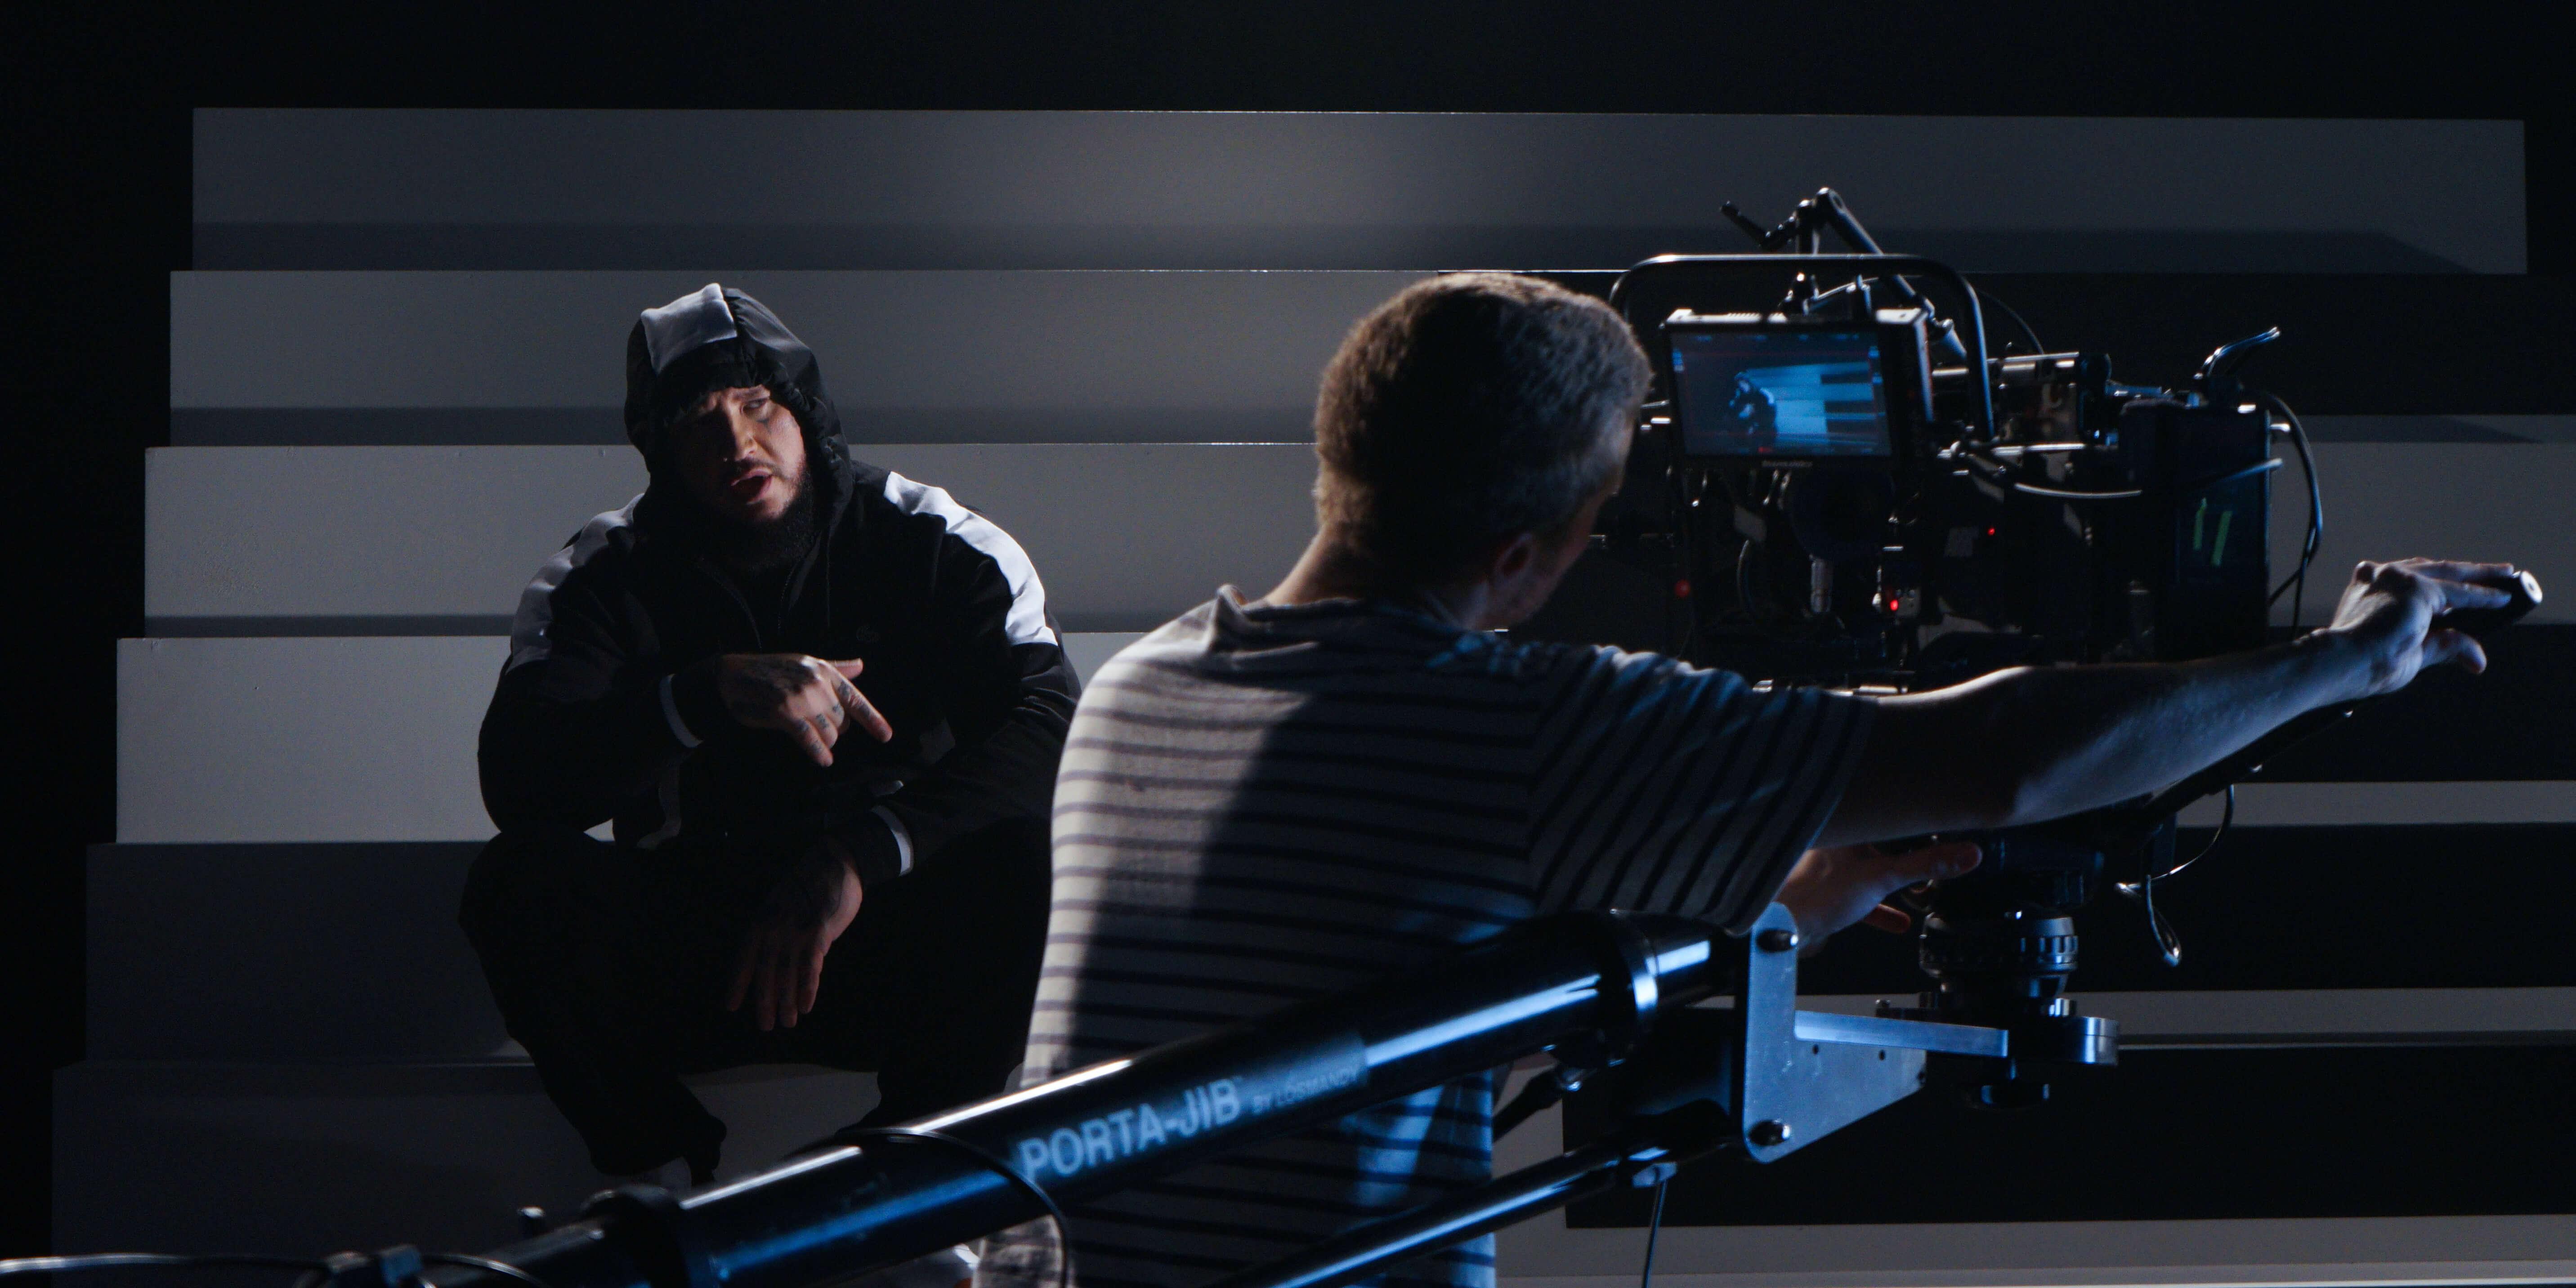 Sur le tournage de Rubrique Necro, le dernier clip de Seth Gueko